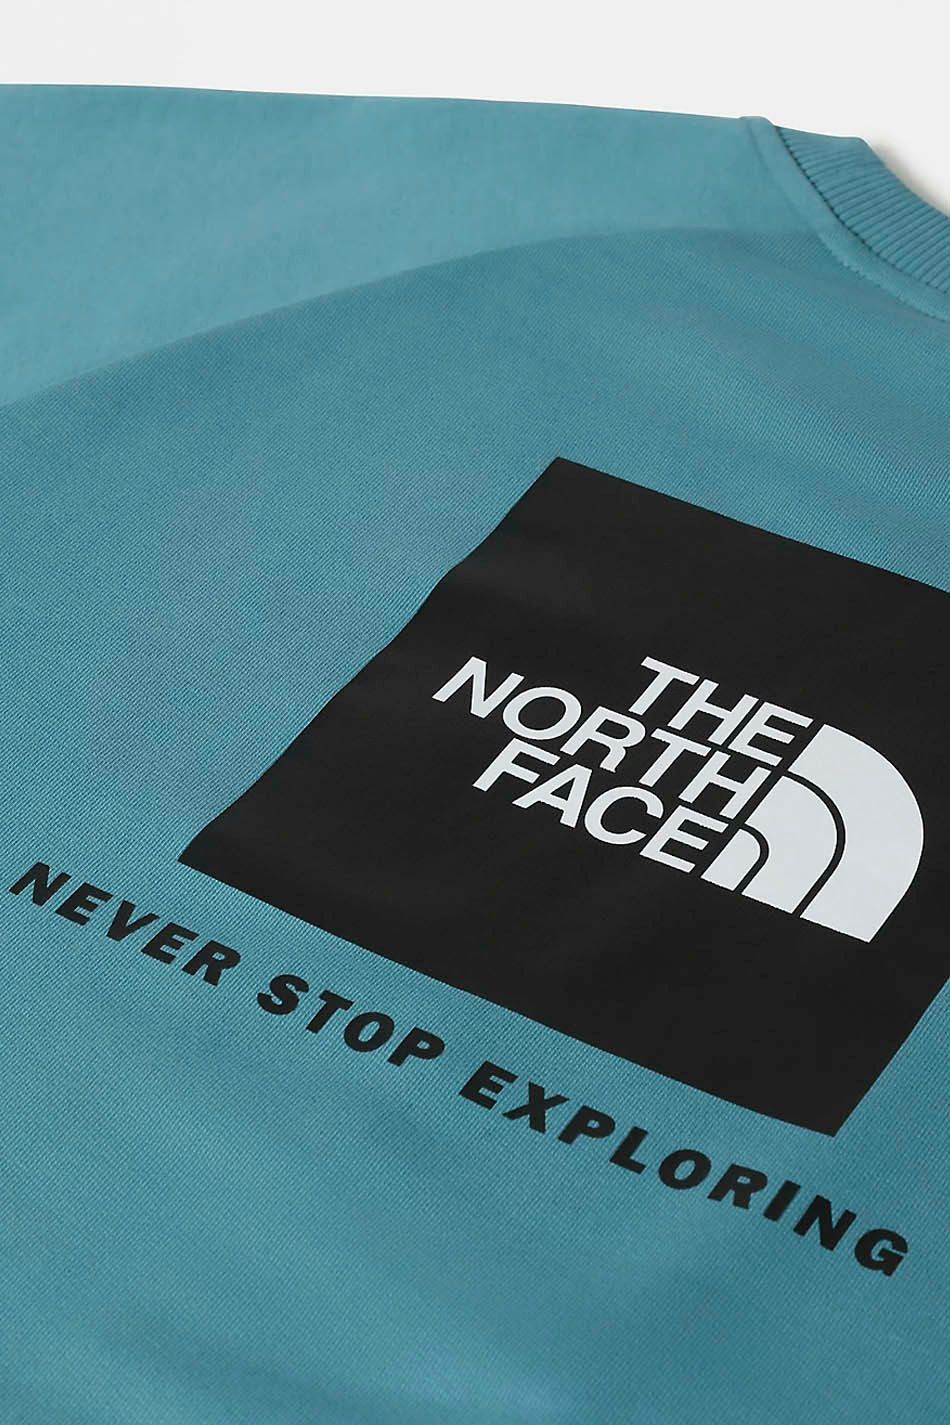 The North Face Redbox Blue Sweatshirt